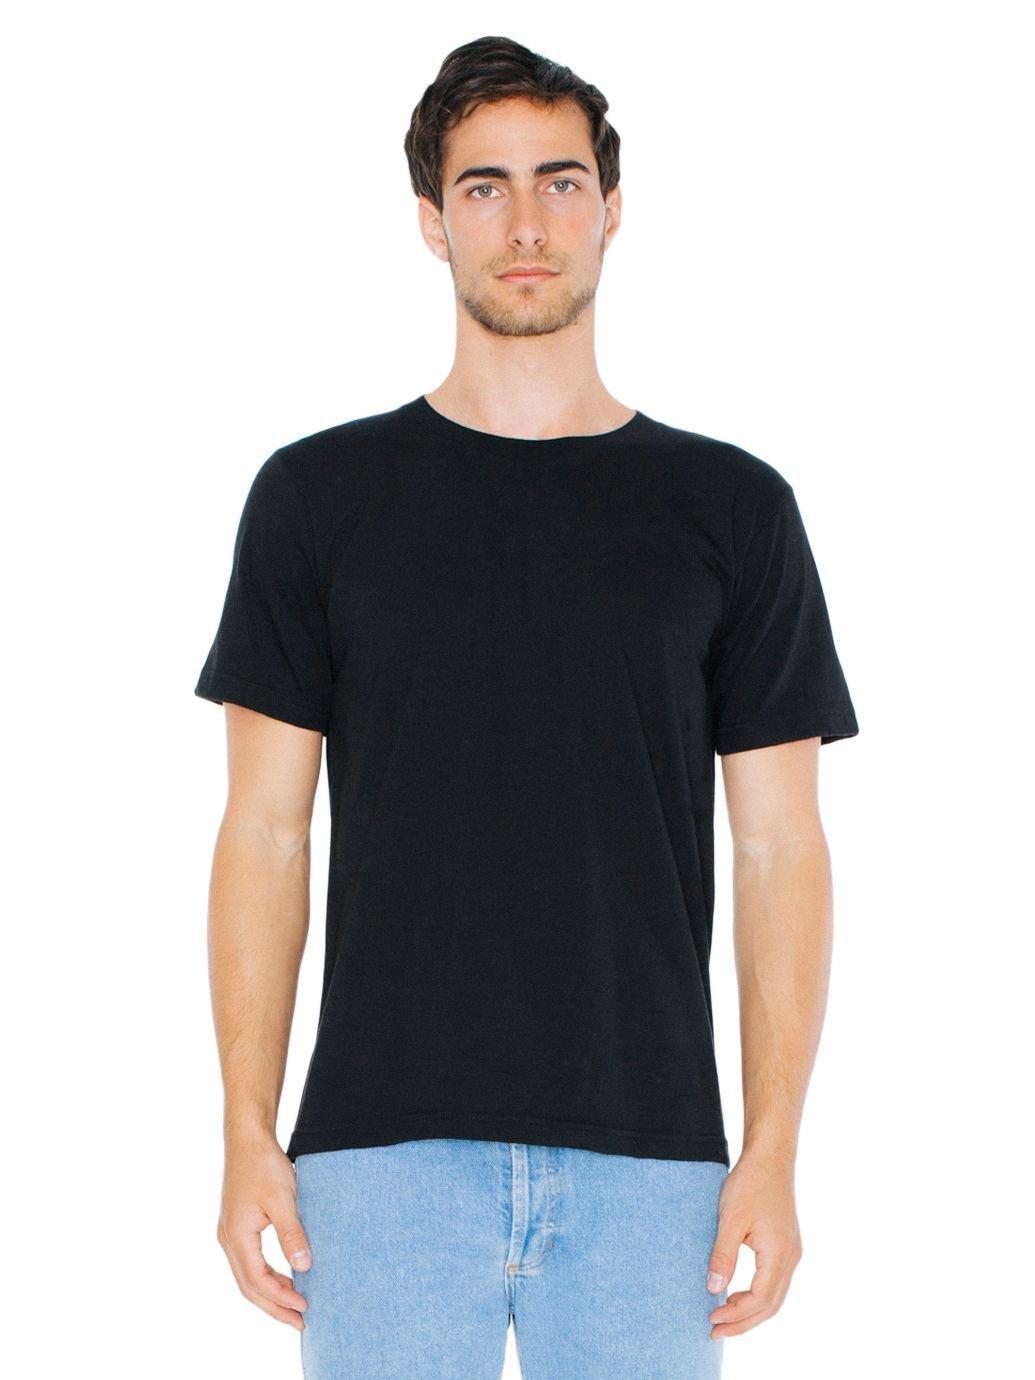 American Apparel Unisex Fine Jersey Short Sleeve T-Shirt, Black, Large